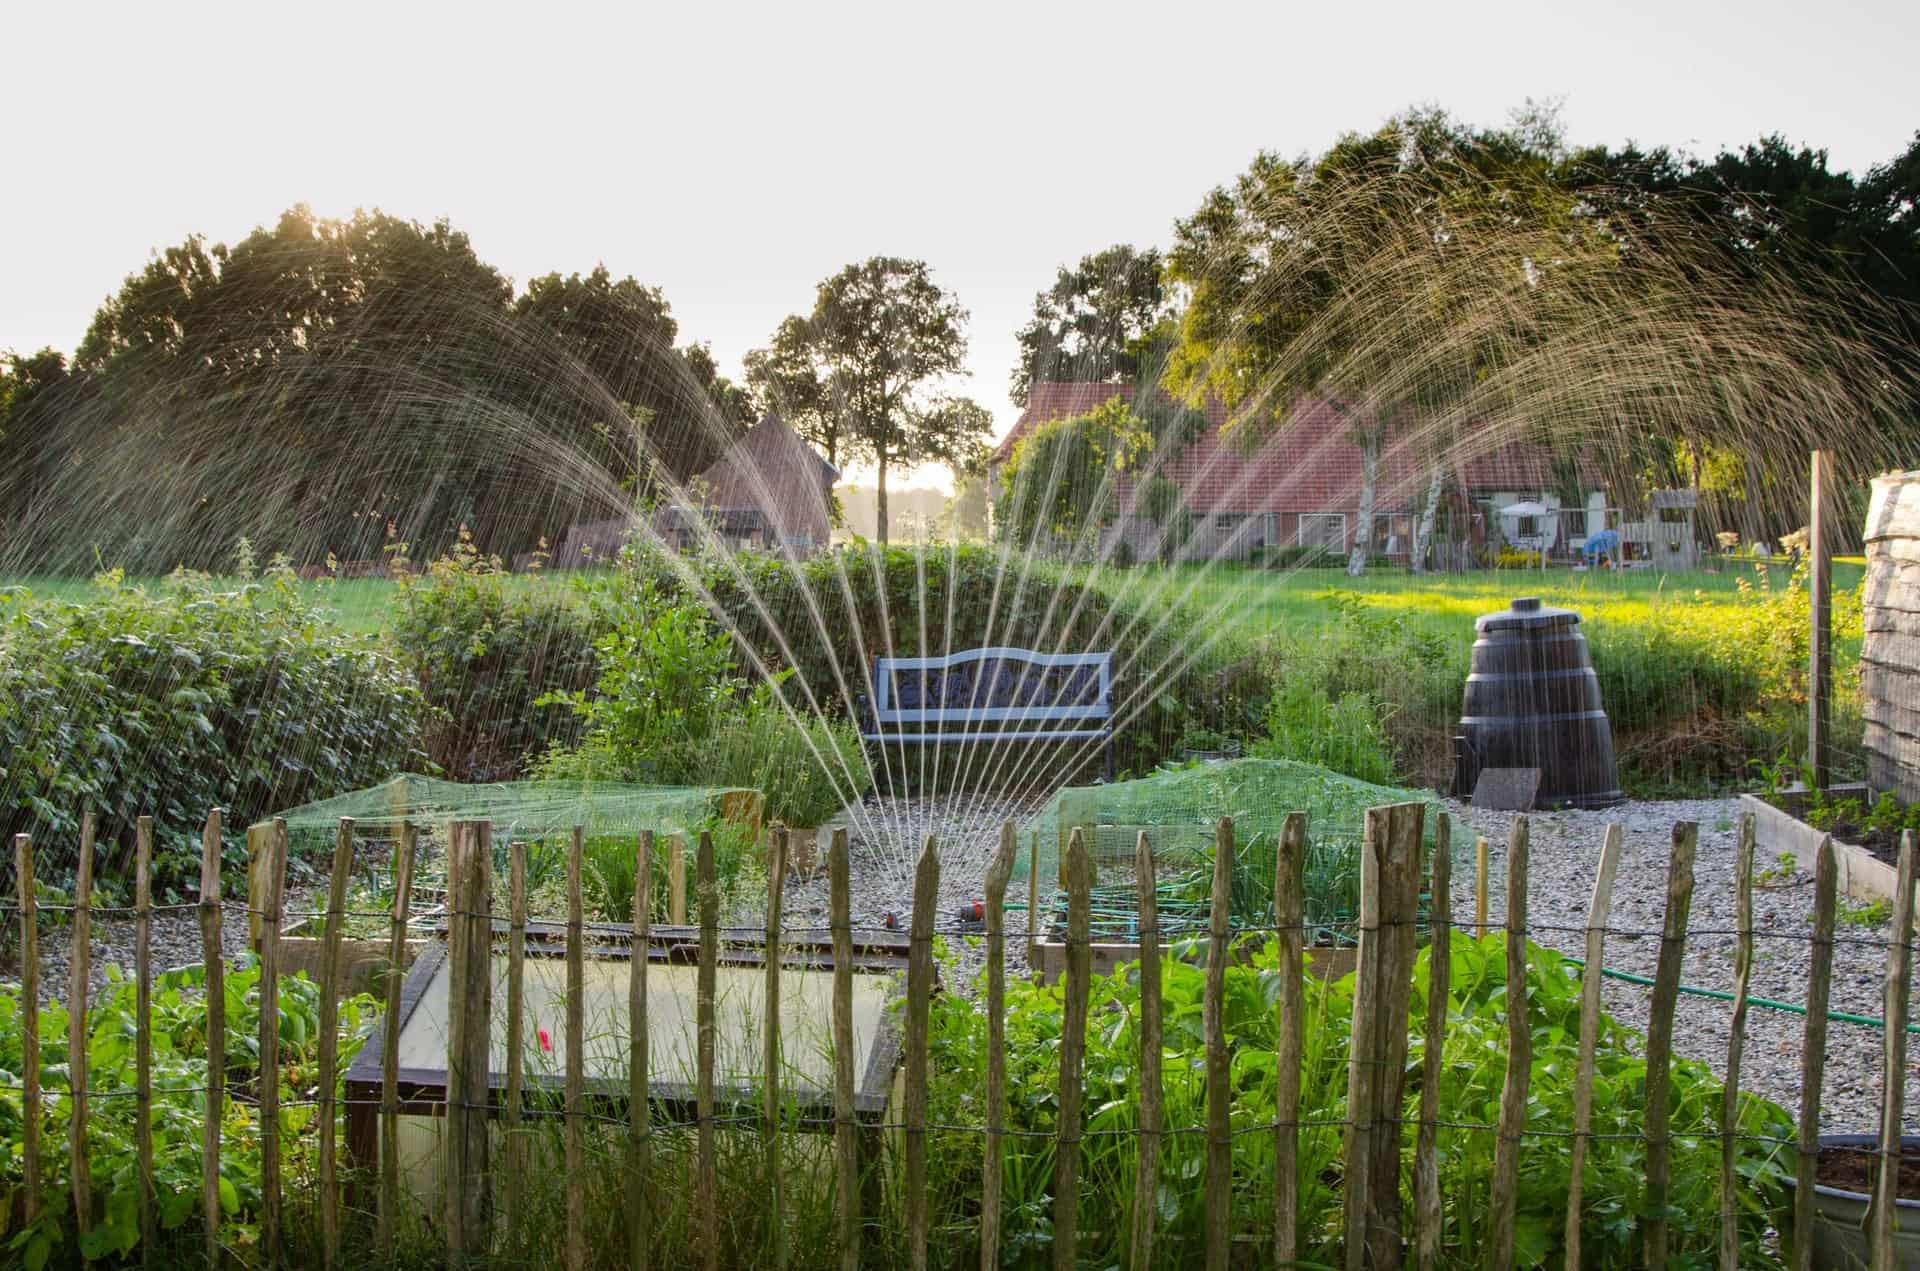 2 Armen Rasensprenger Gartensprenger Sprinkler Bewässerung Garten Kreisregner m